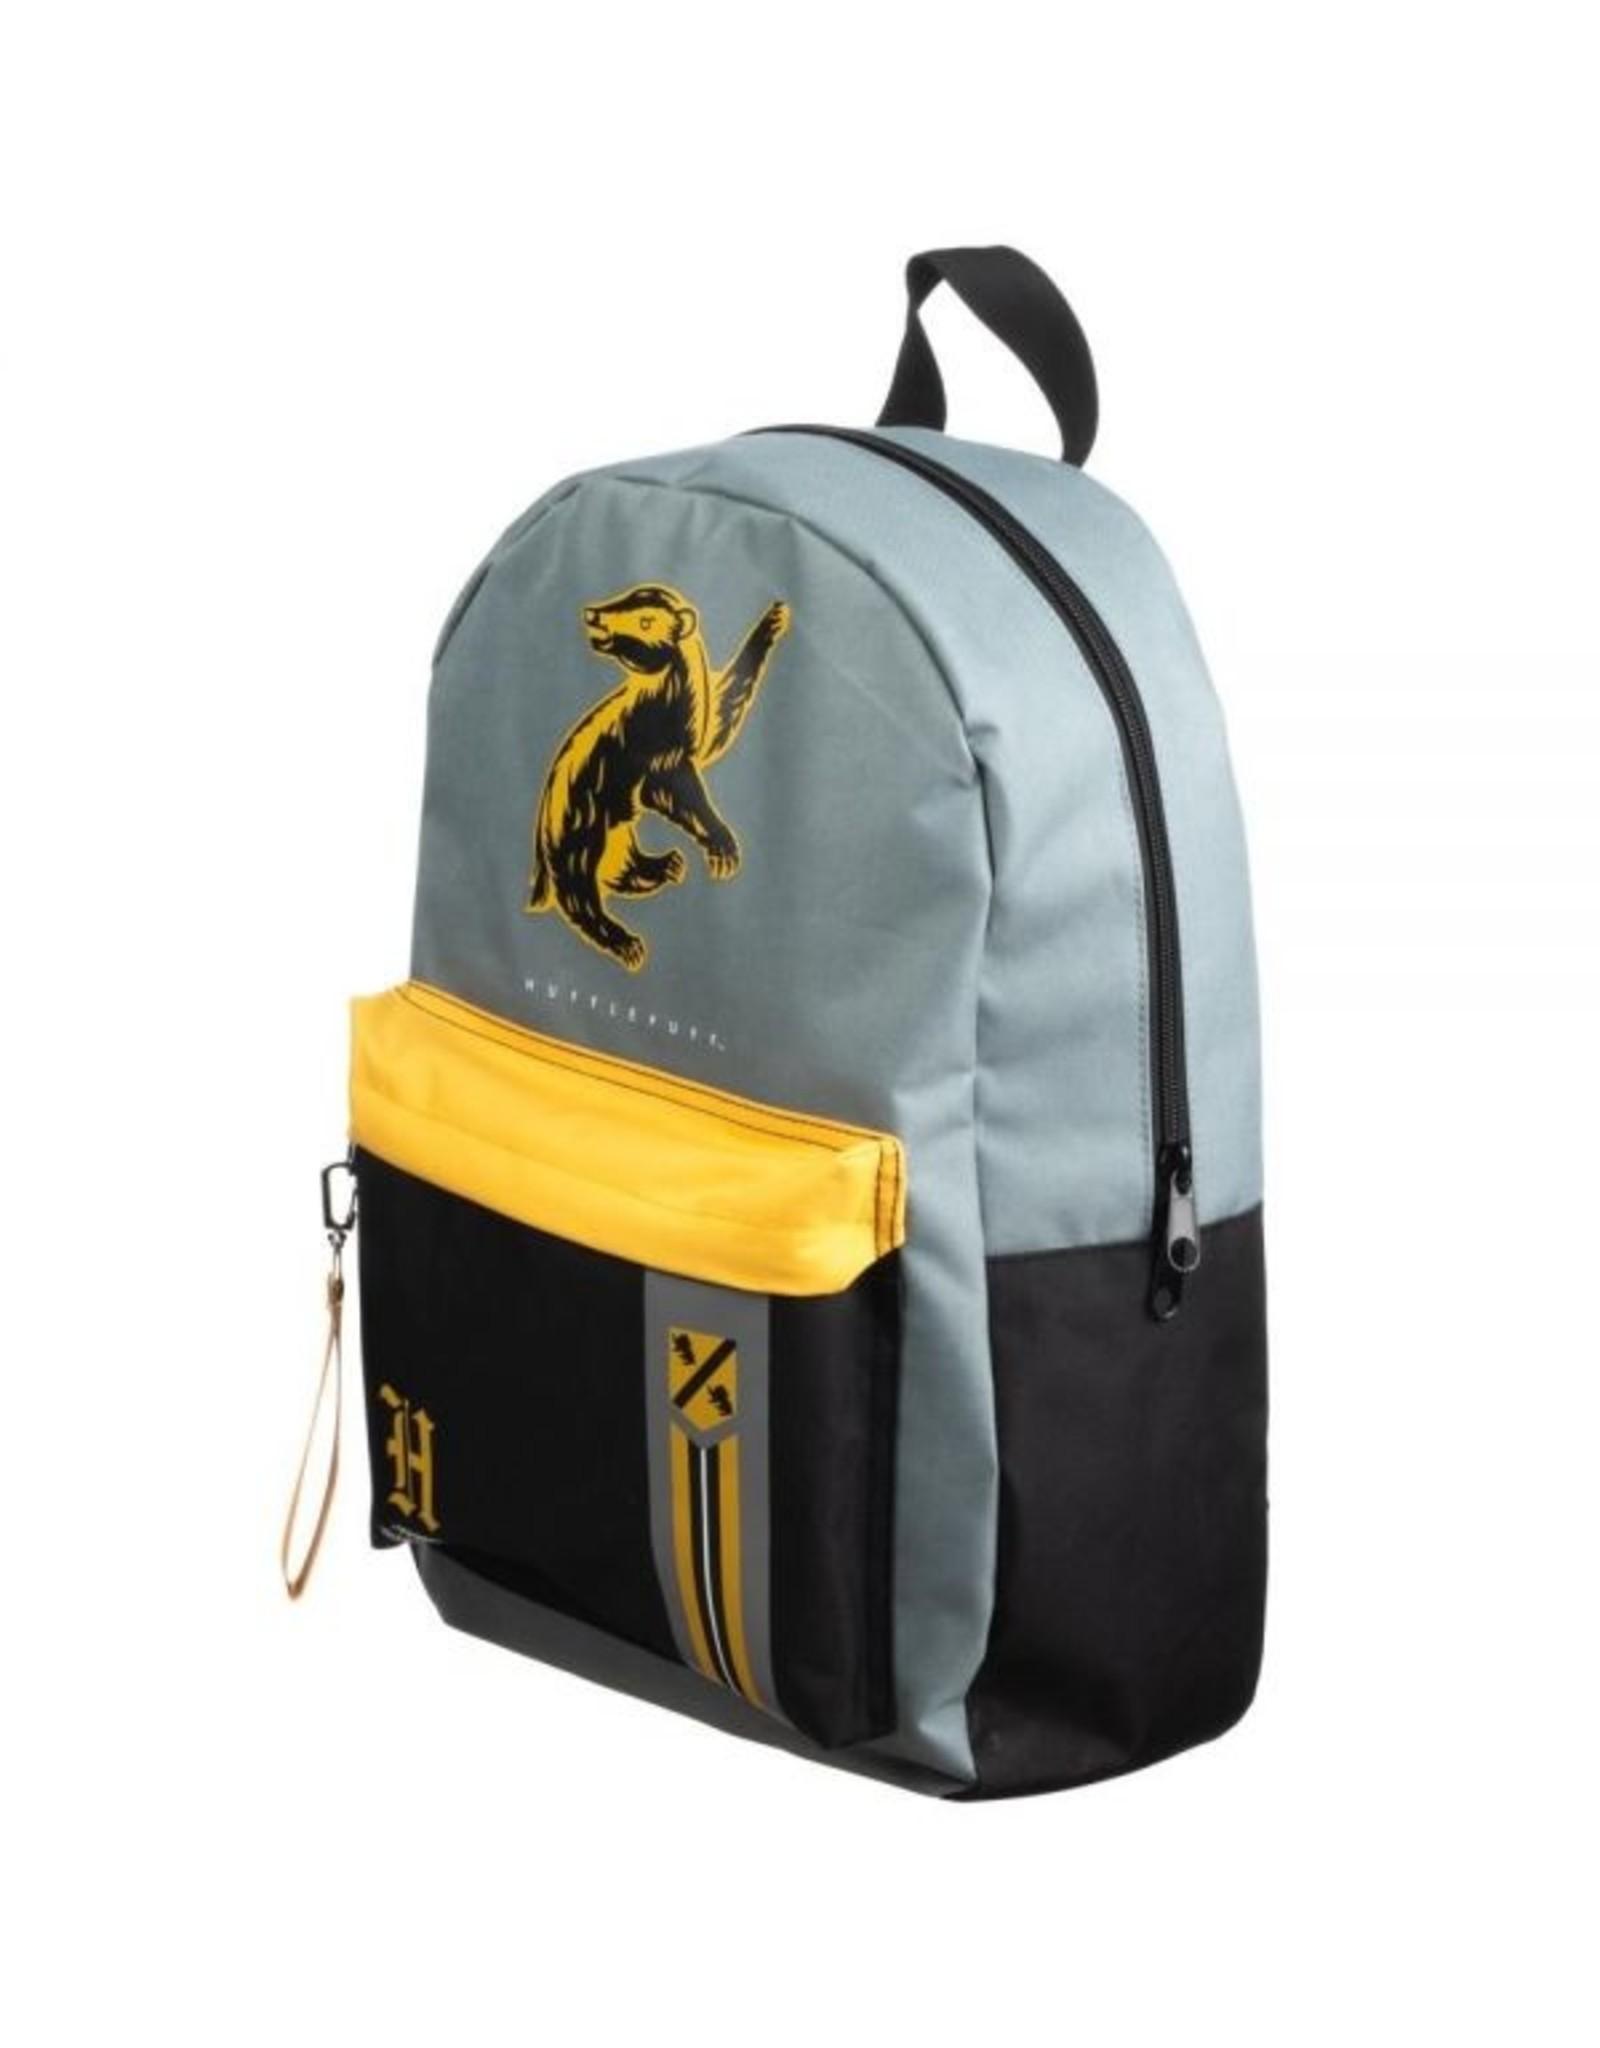 Harry Potter Harry Potter bags - Harry Potter Hufflepuff backpack 40cm